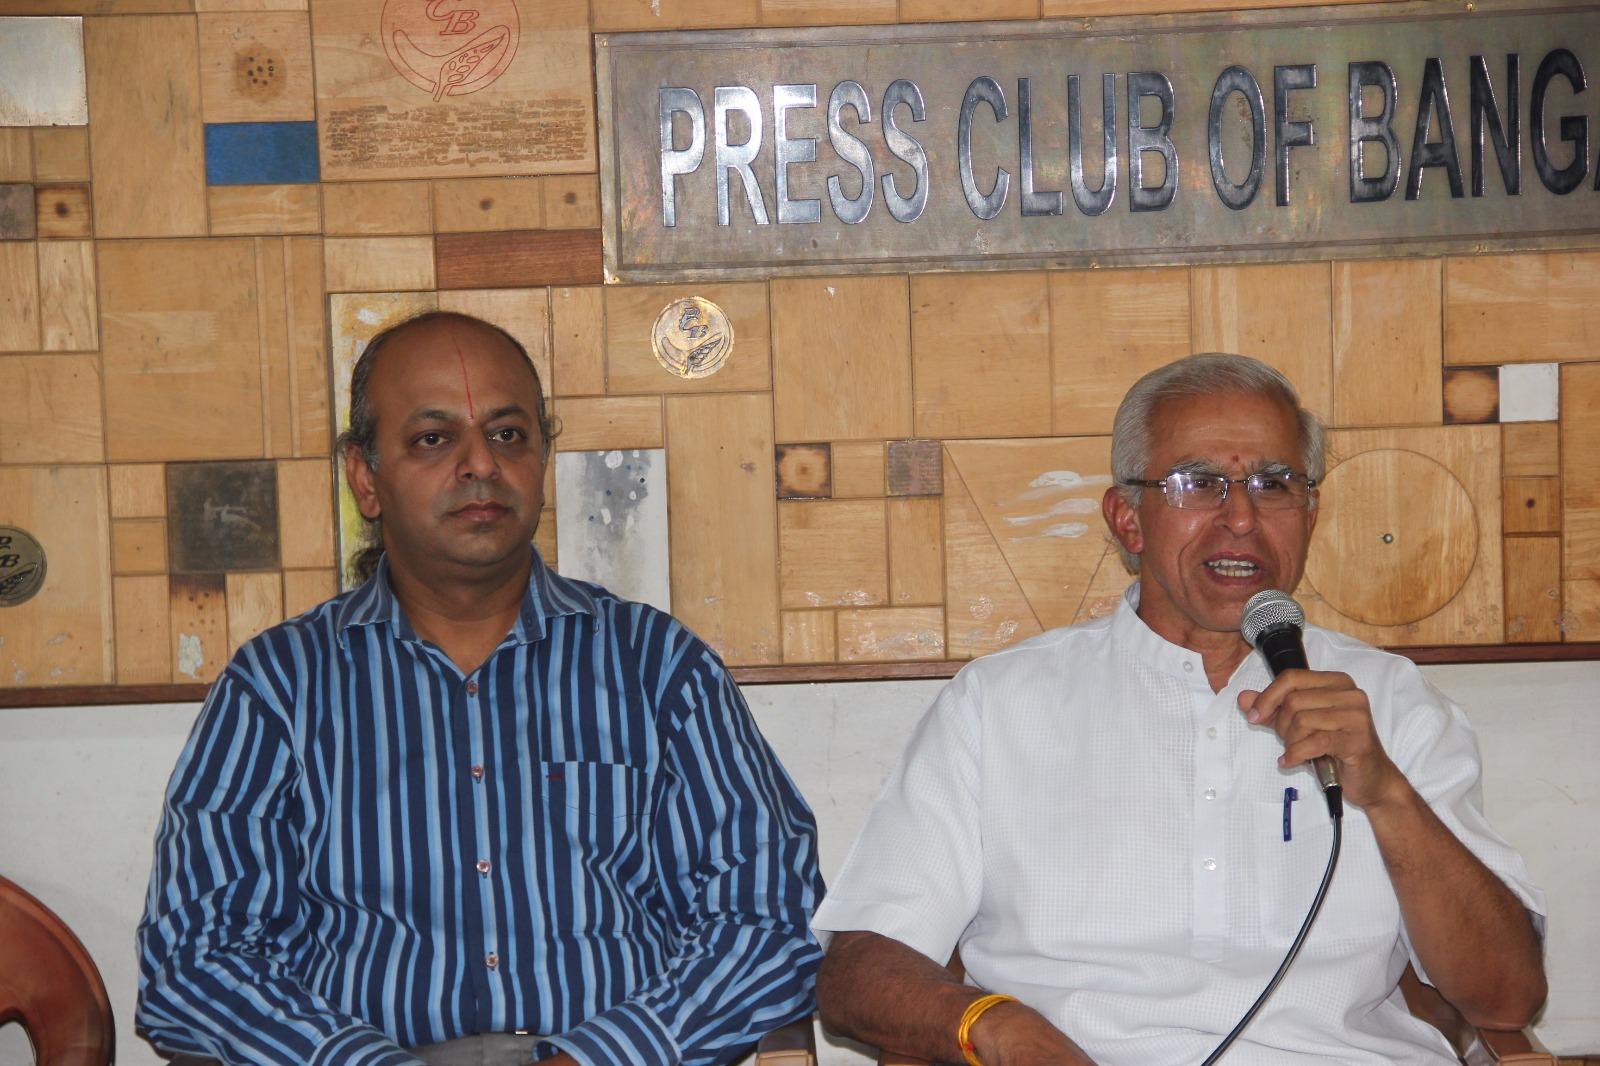 Samskrita Bharati's 3-day National Conference to be held on January 6, 7 & 8, 2017 at Udupi, Karnataka